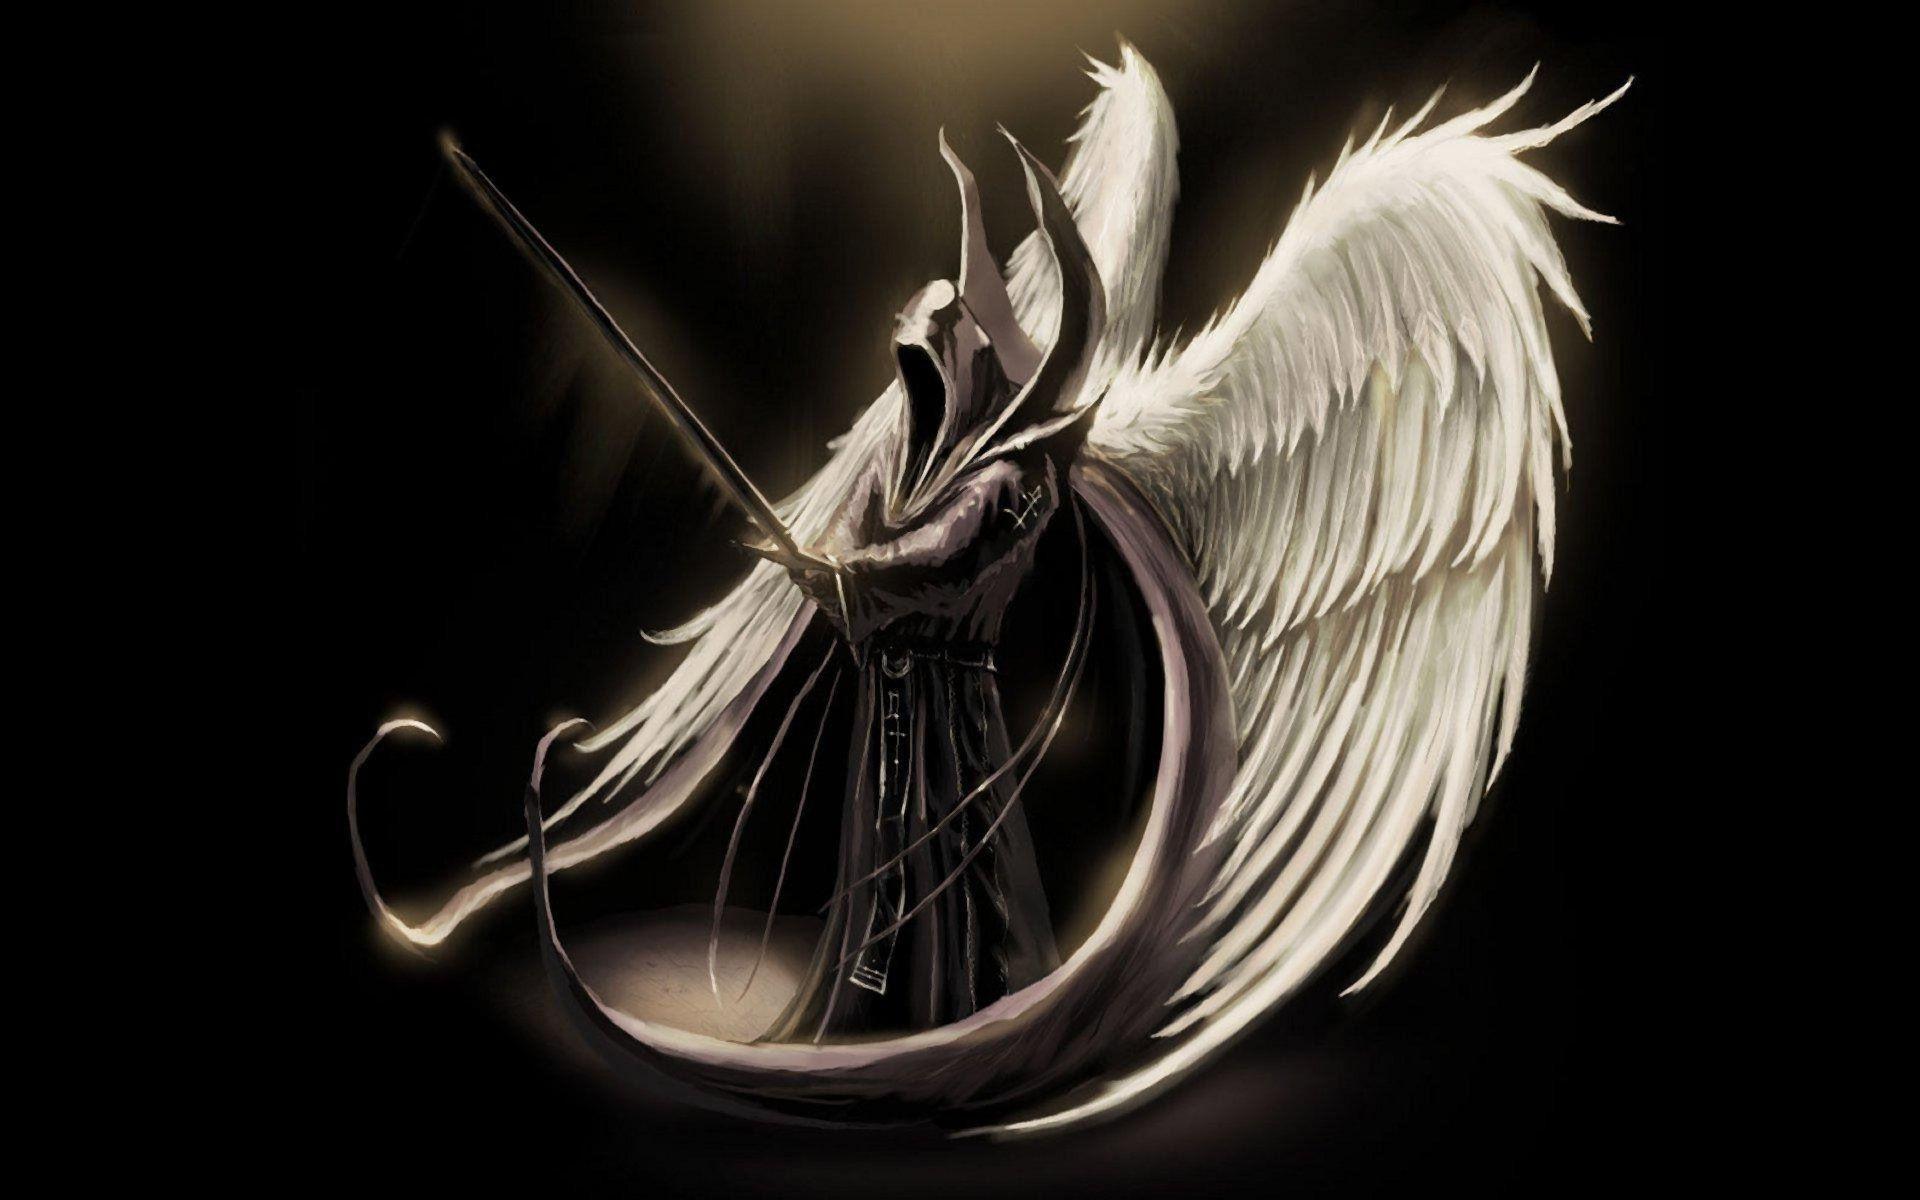 1920x1200, Free Angel Wallpaper Beautiful Fantasy Angel - Dark Angel With Sword - HD Wallpaper